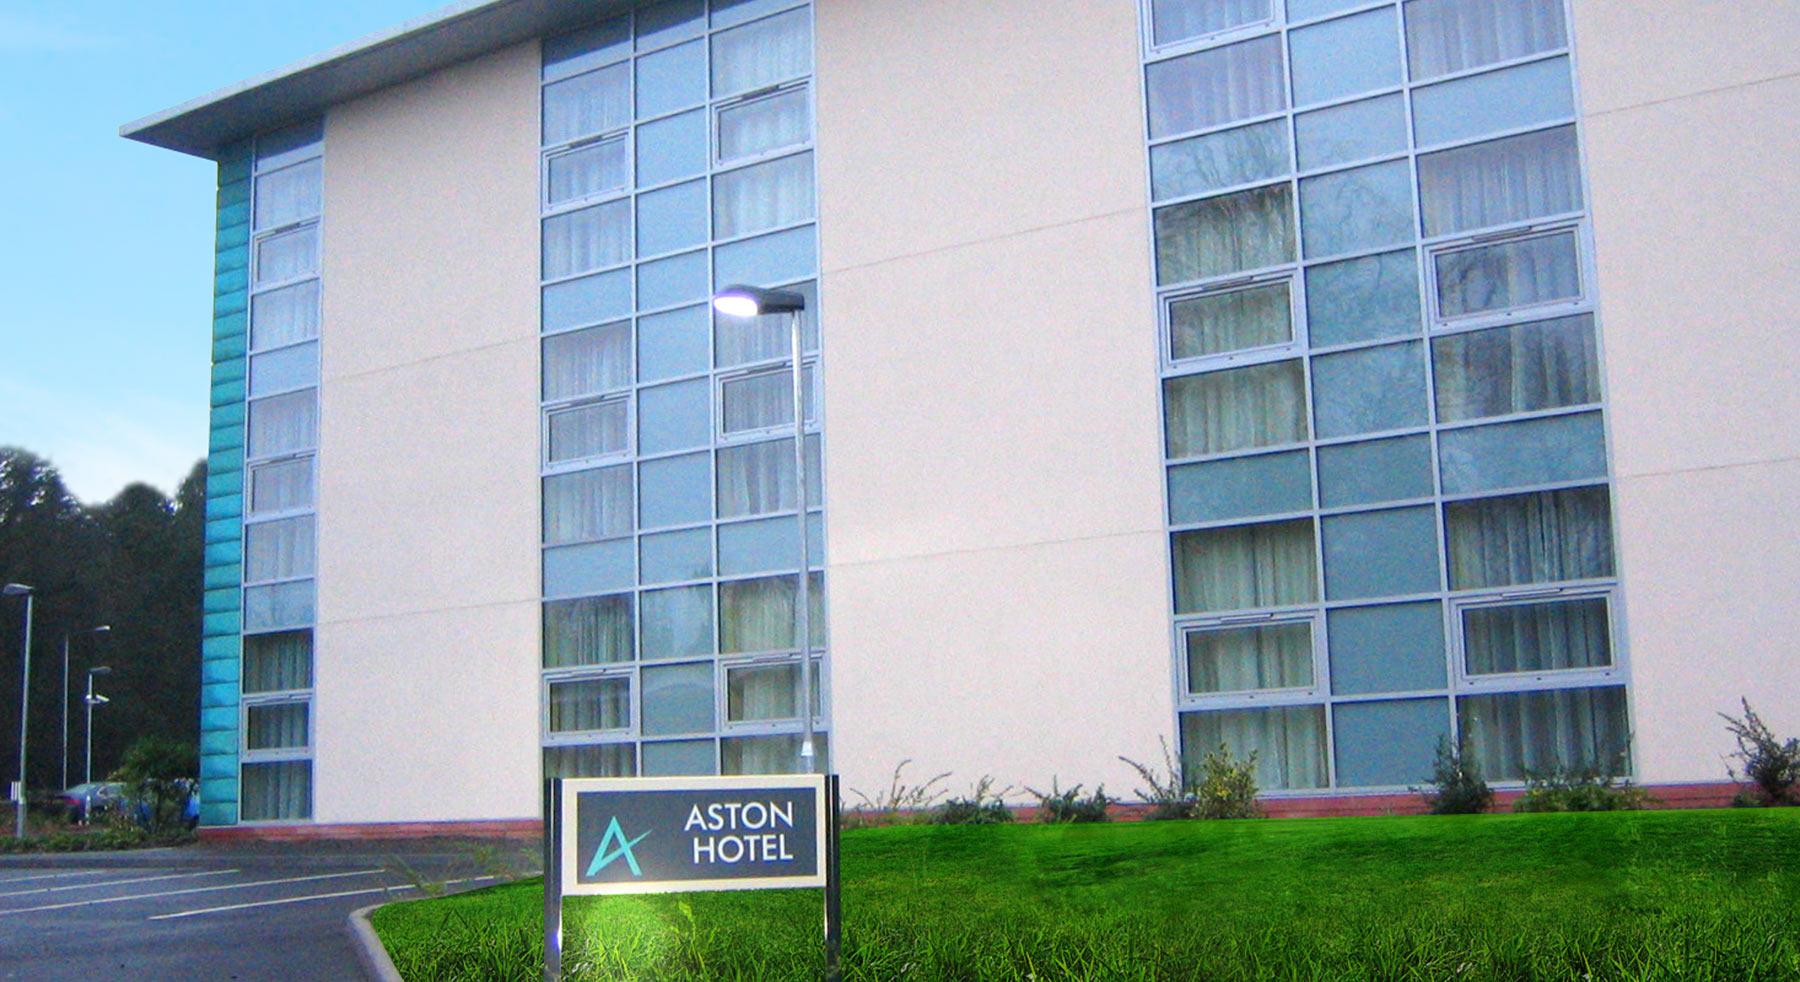 Aston Hotel Dumfries Visual Concept Ltd